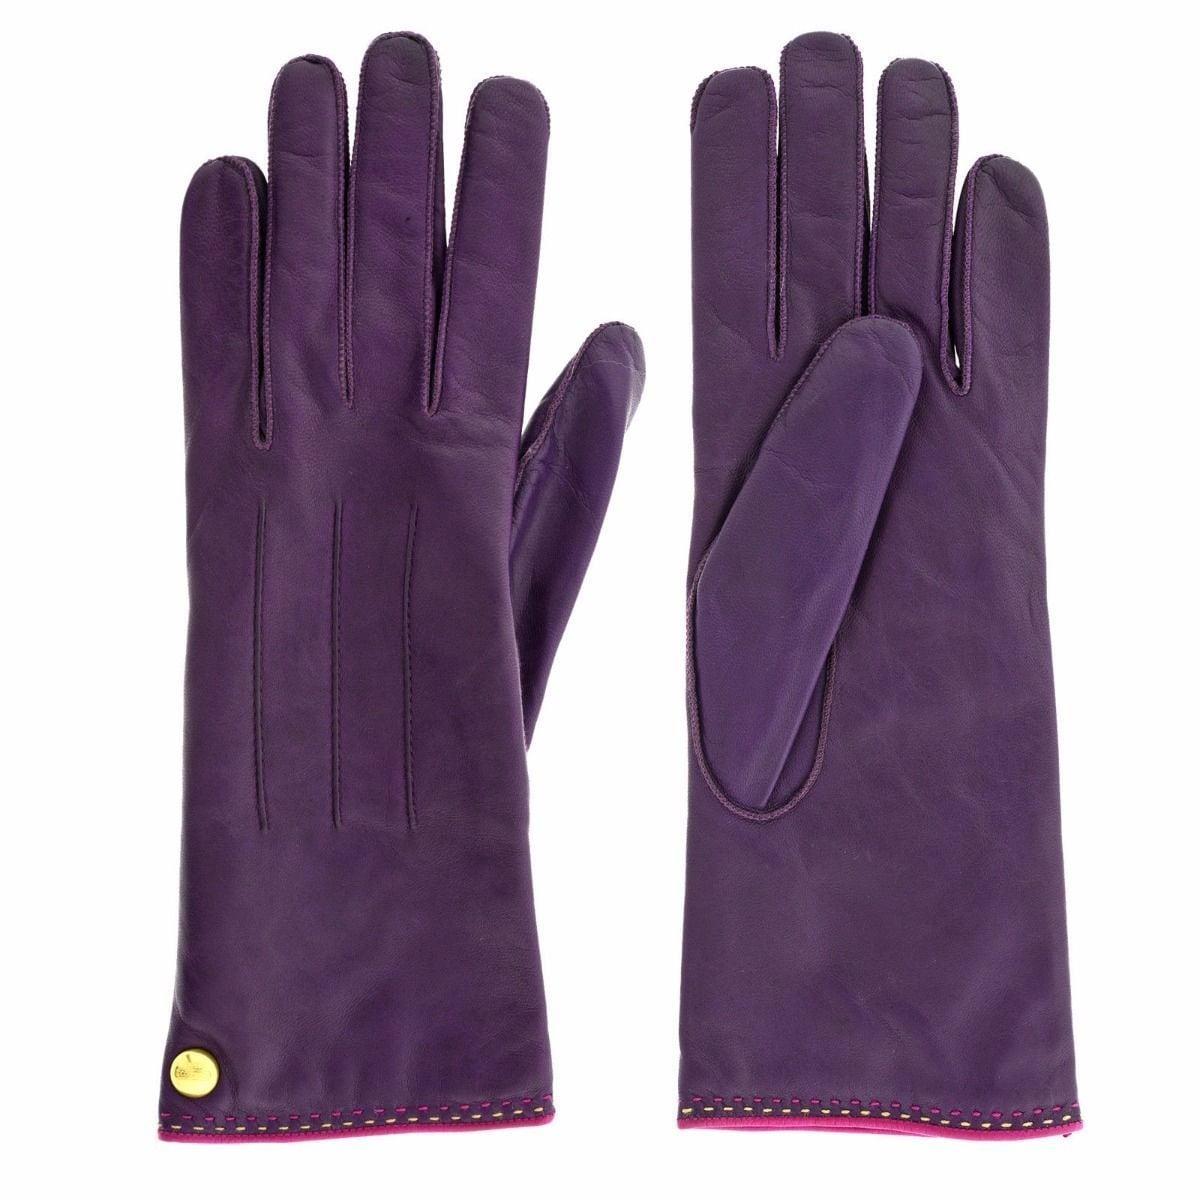 Coach Plum Leather Logo Gloves (S), Women's, Pink